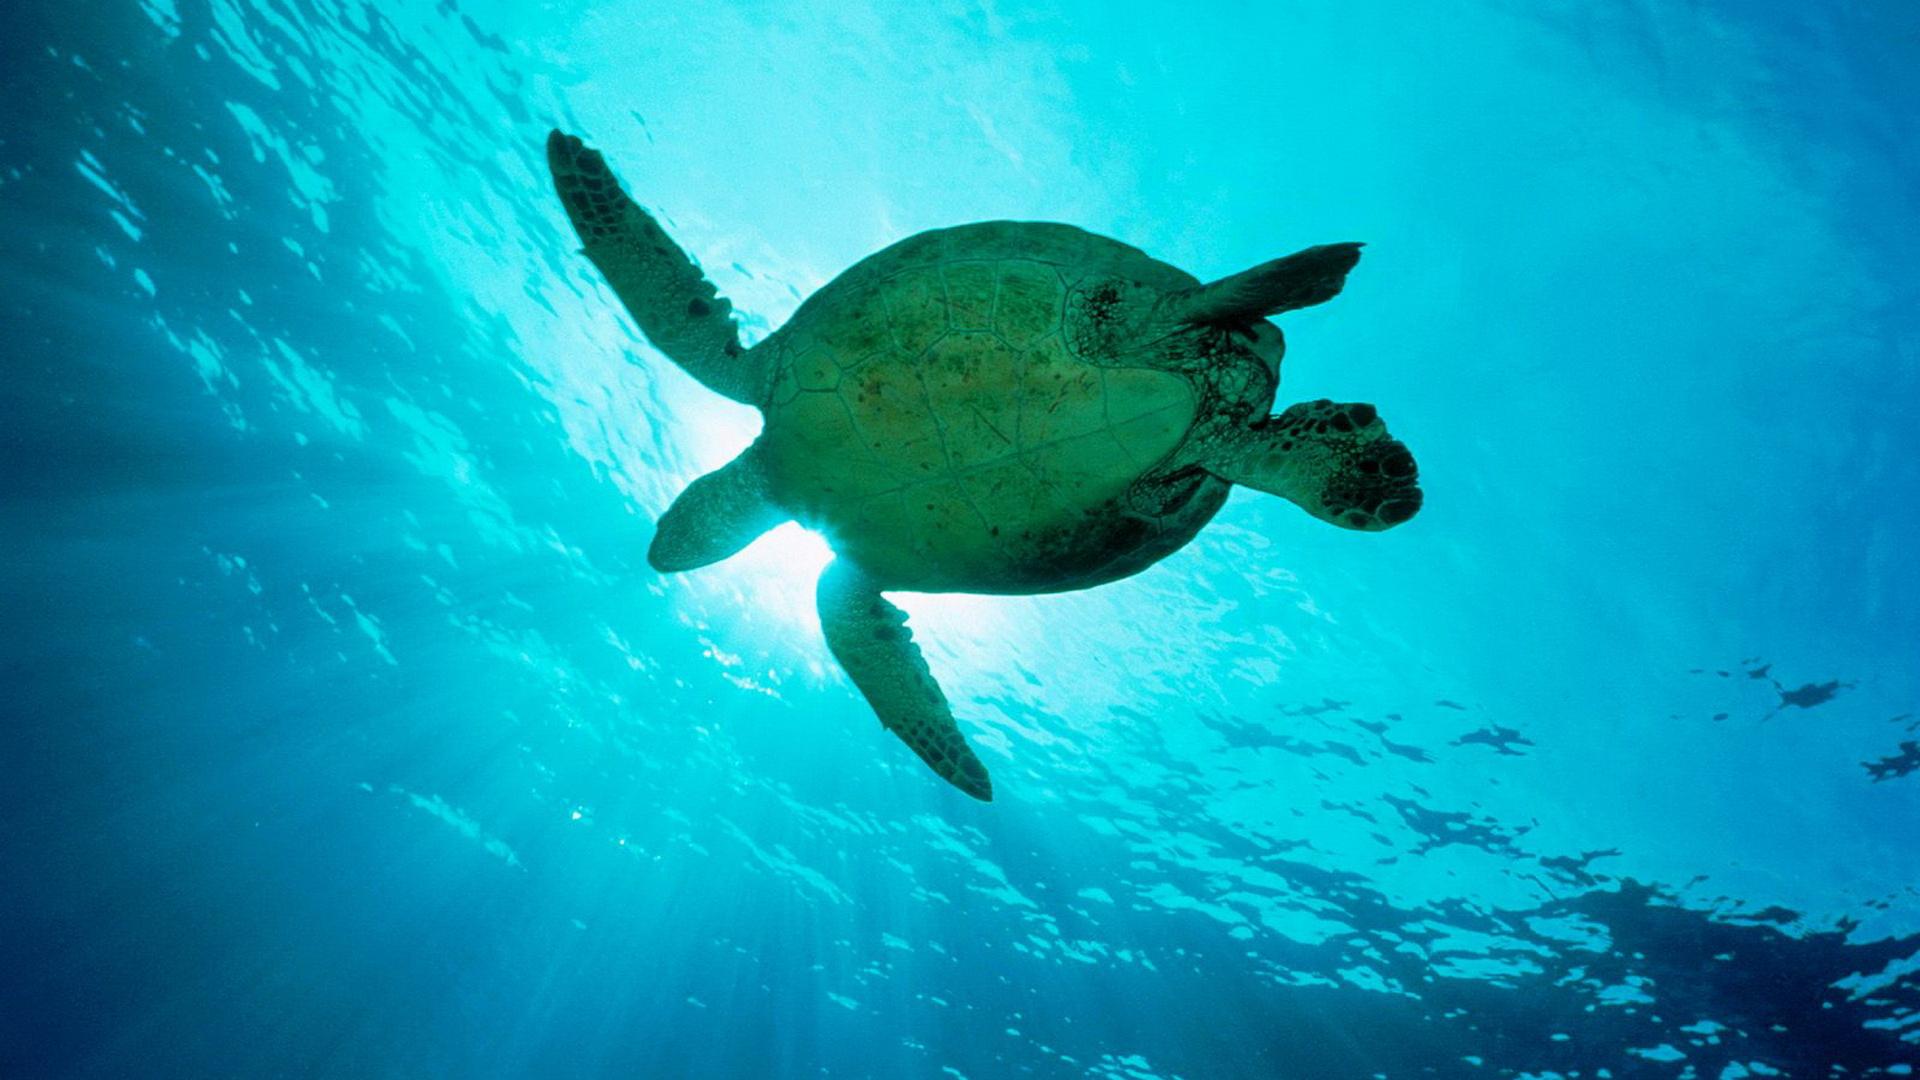 Free Download Sea Turtles Wallpaper 1920x1080 Sea Turtles